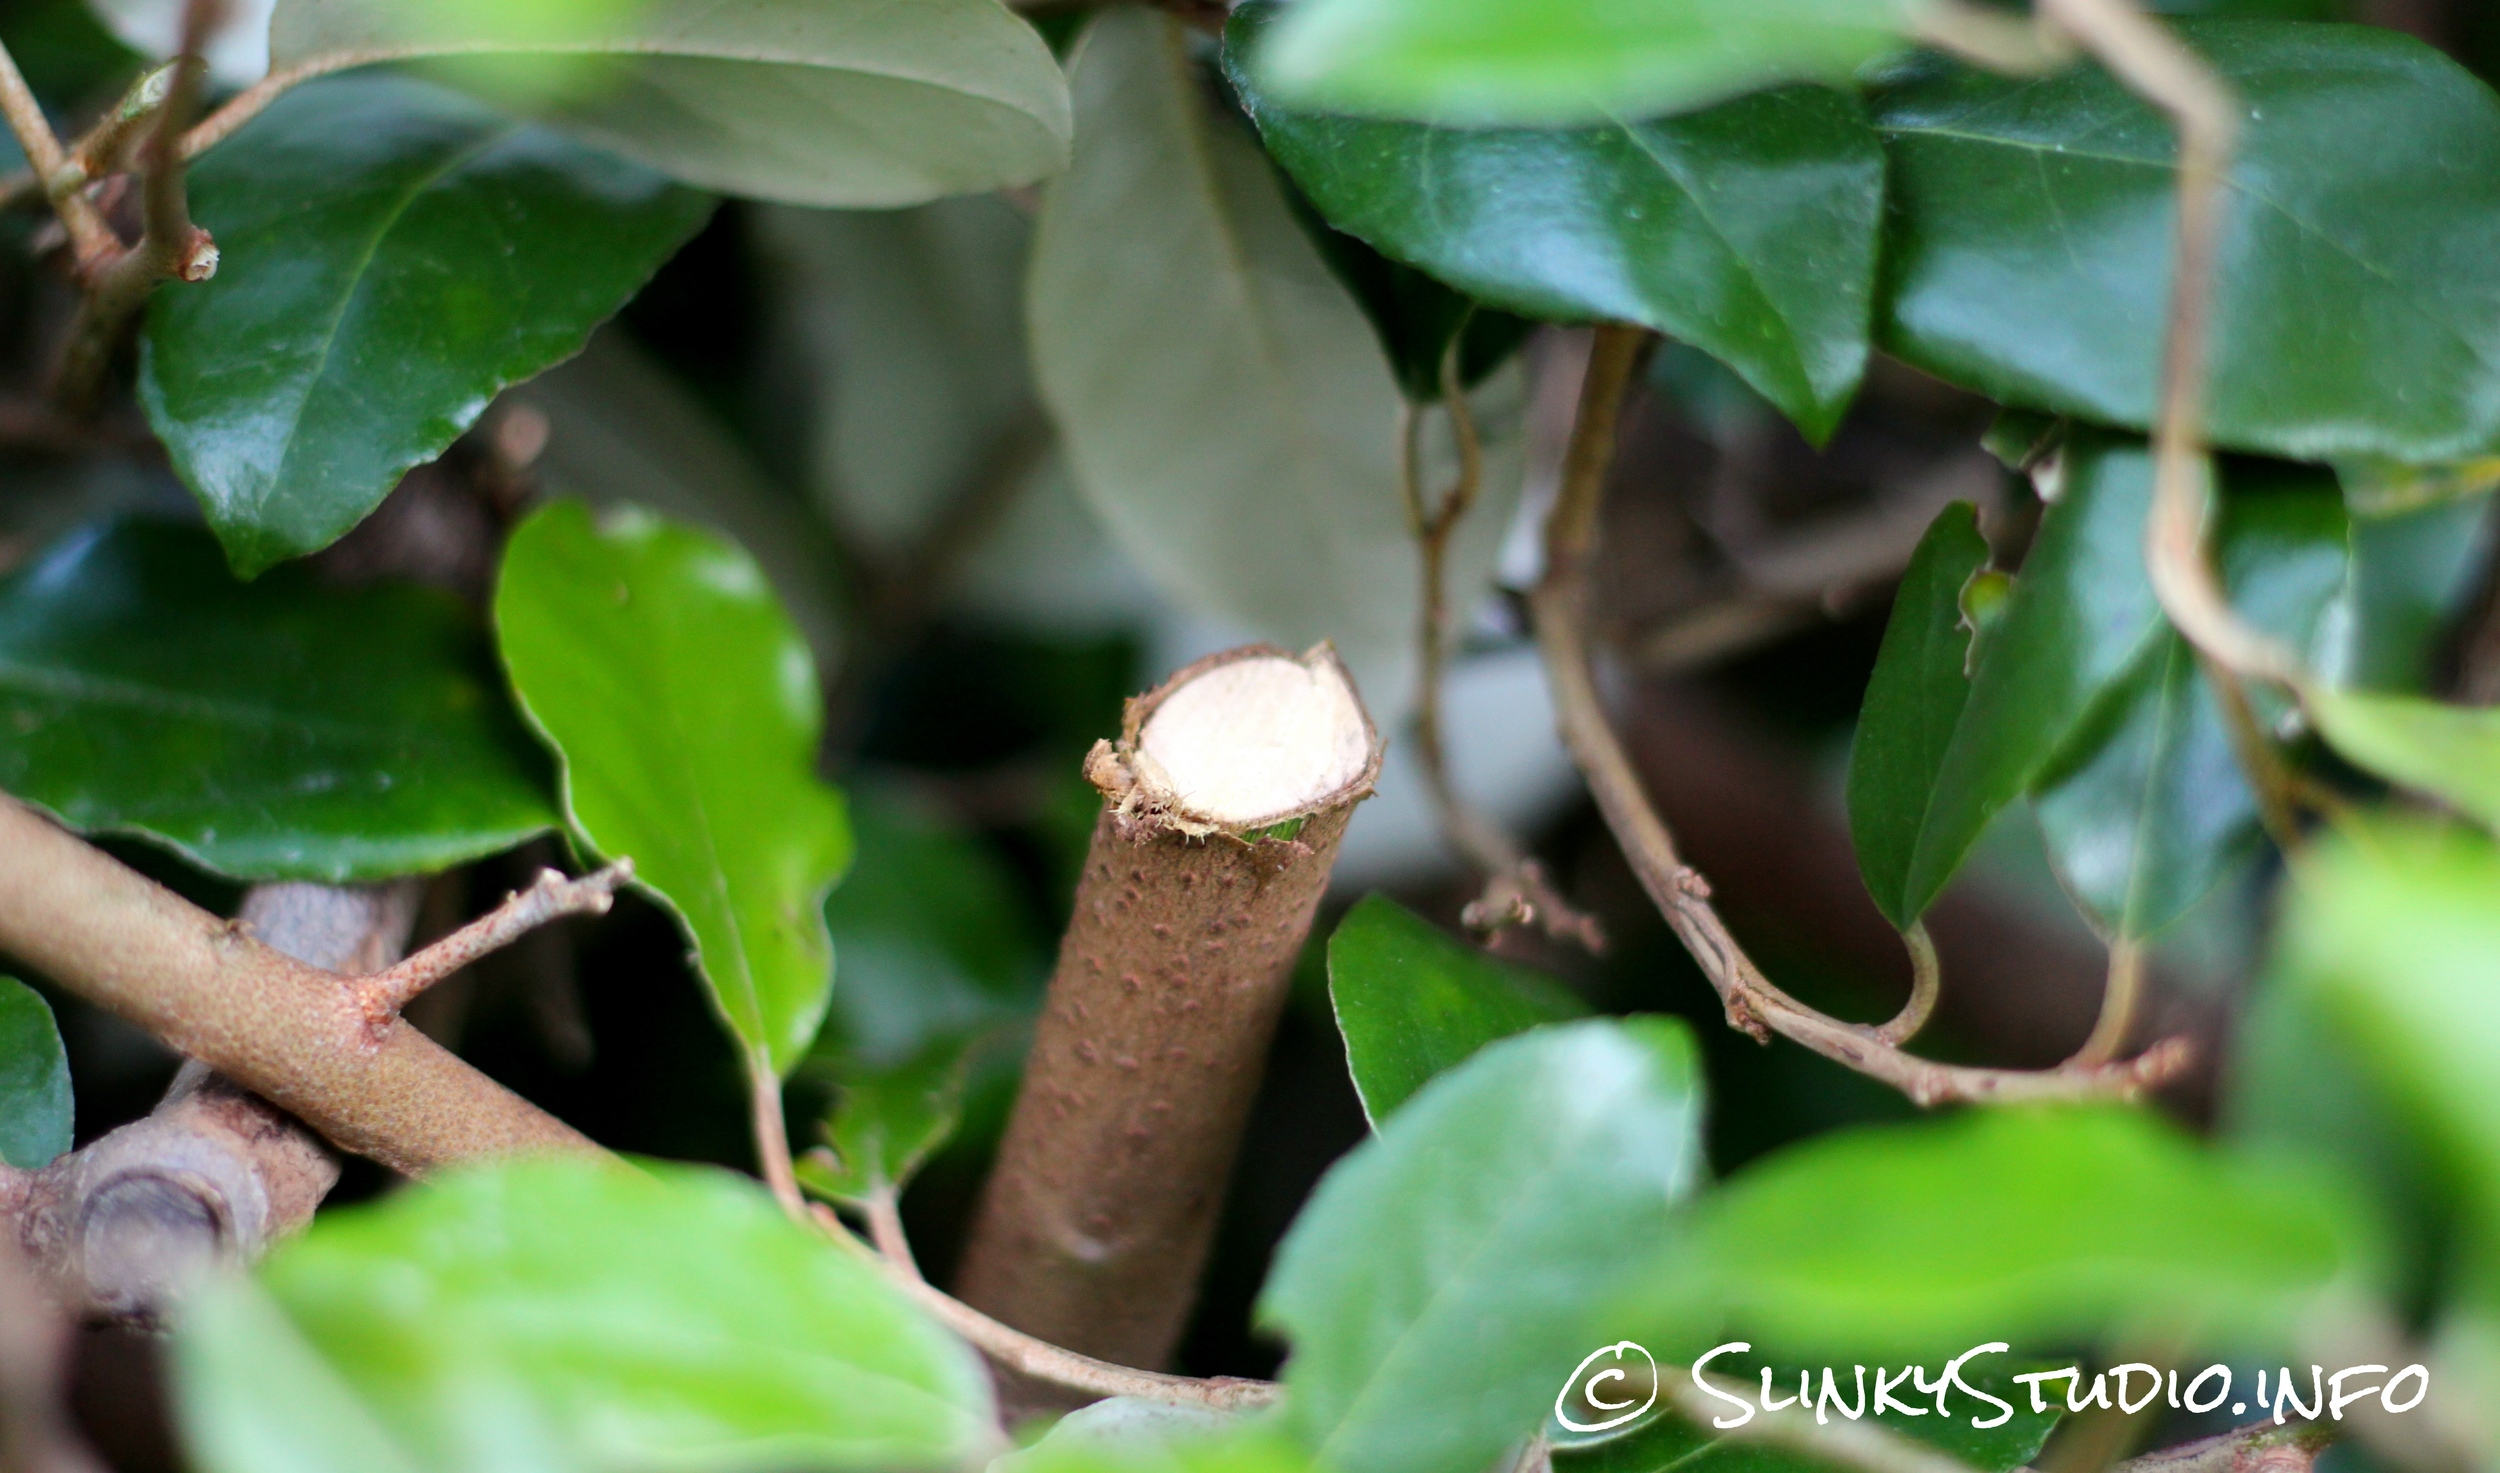 Ryobi One+ Hedge Trimmer Thick Cut Branch.jpg